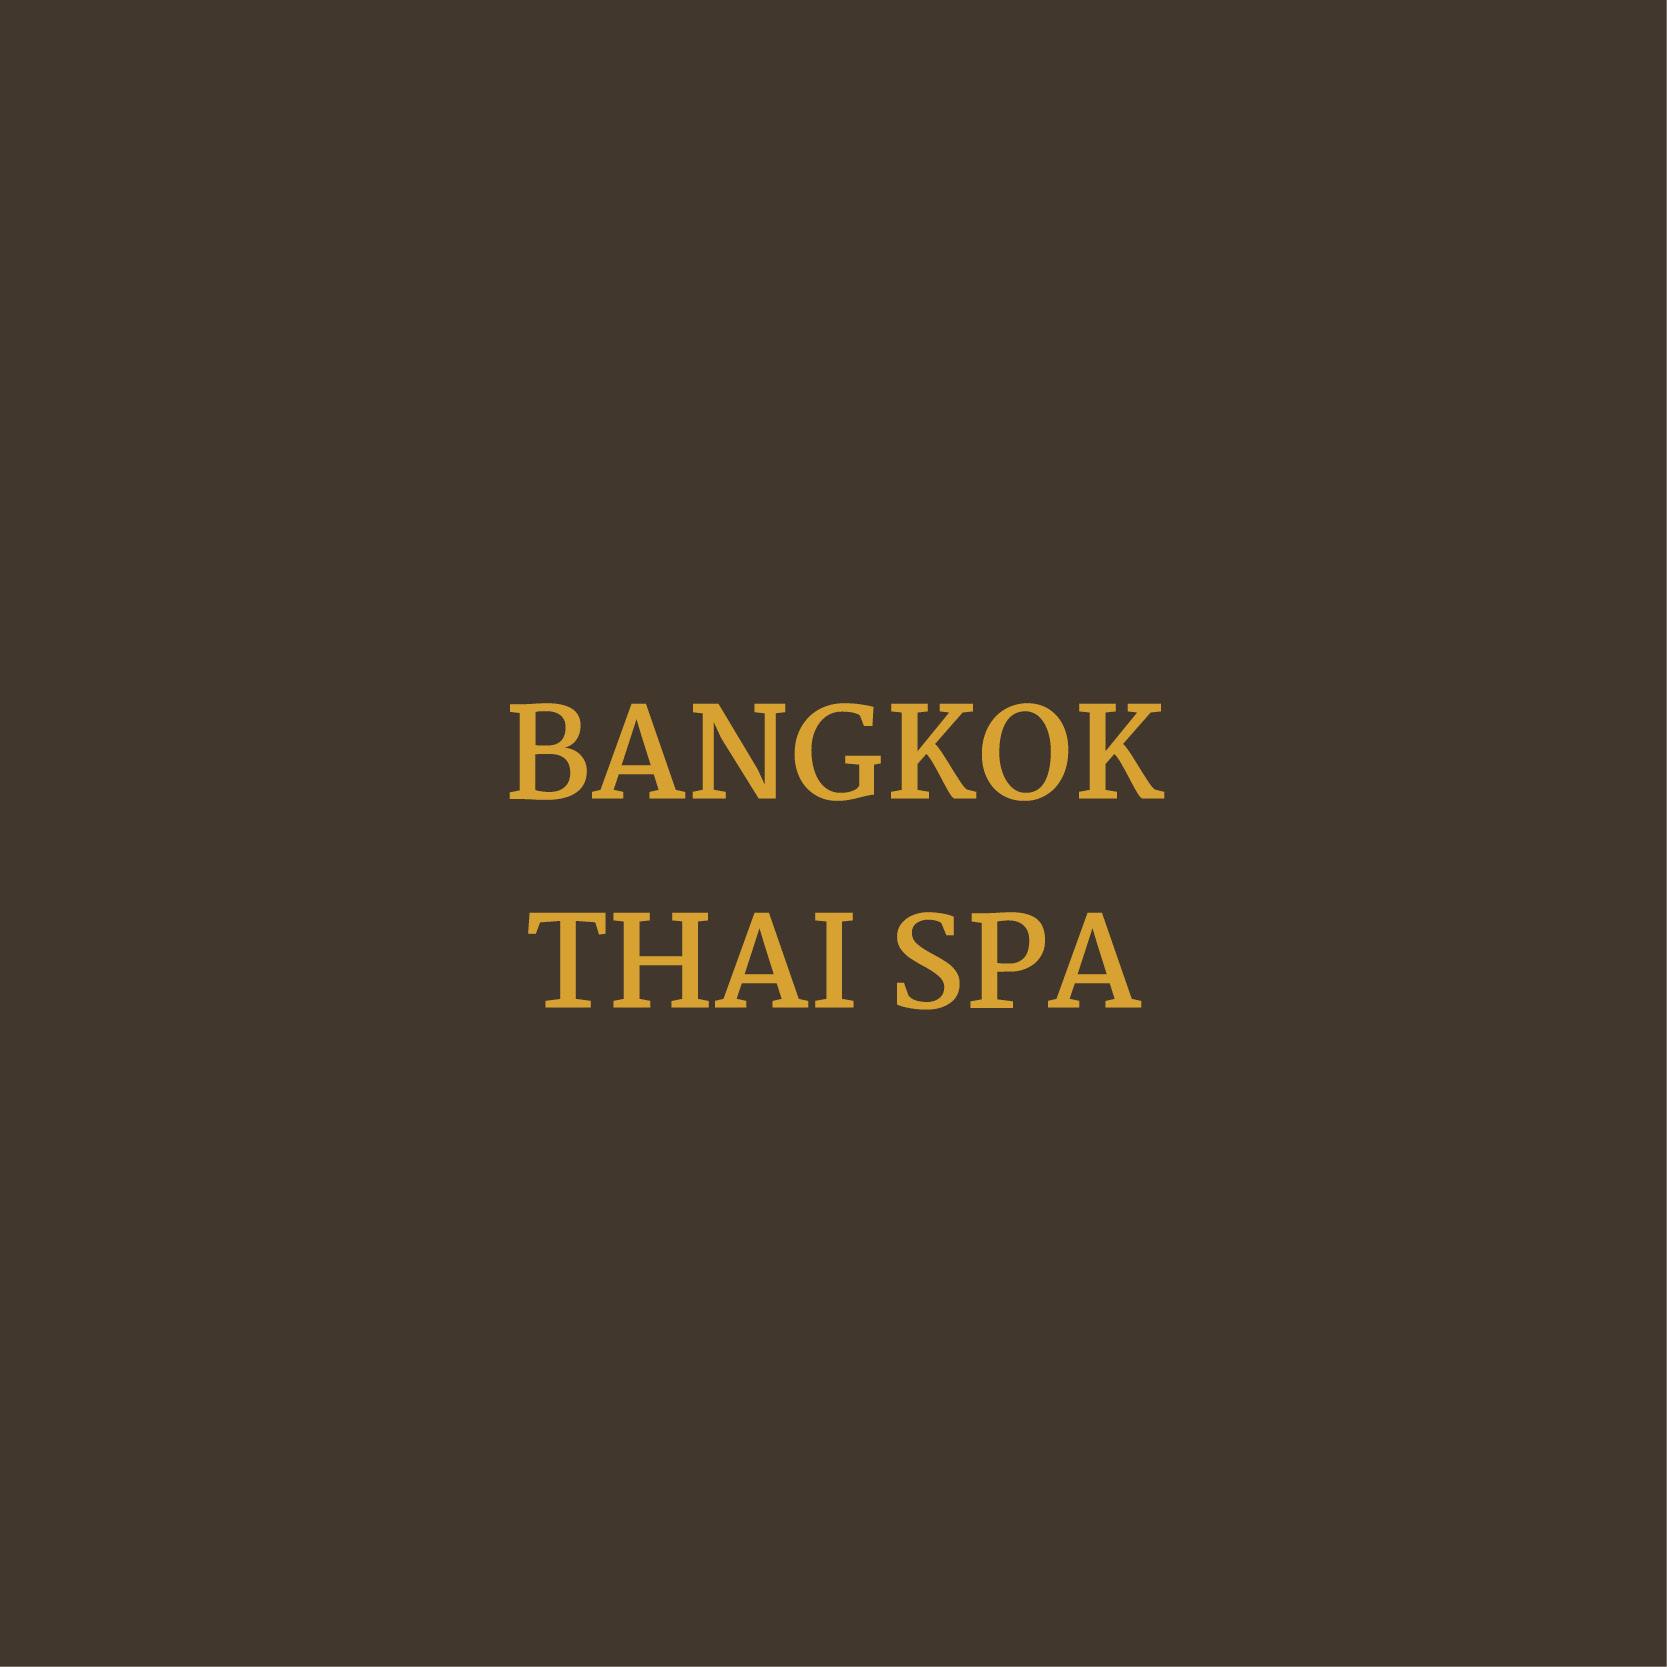 Beauty Fitness Button 14 Bangkok Thai Spa